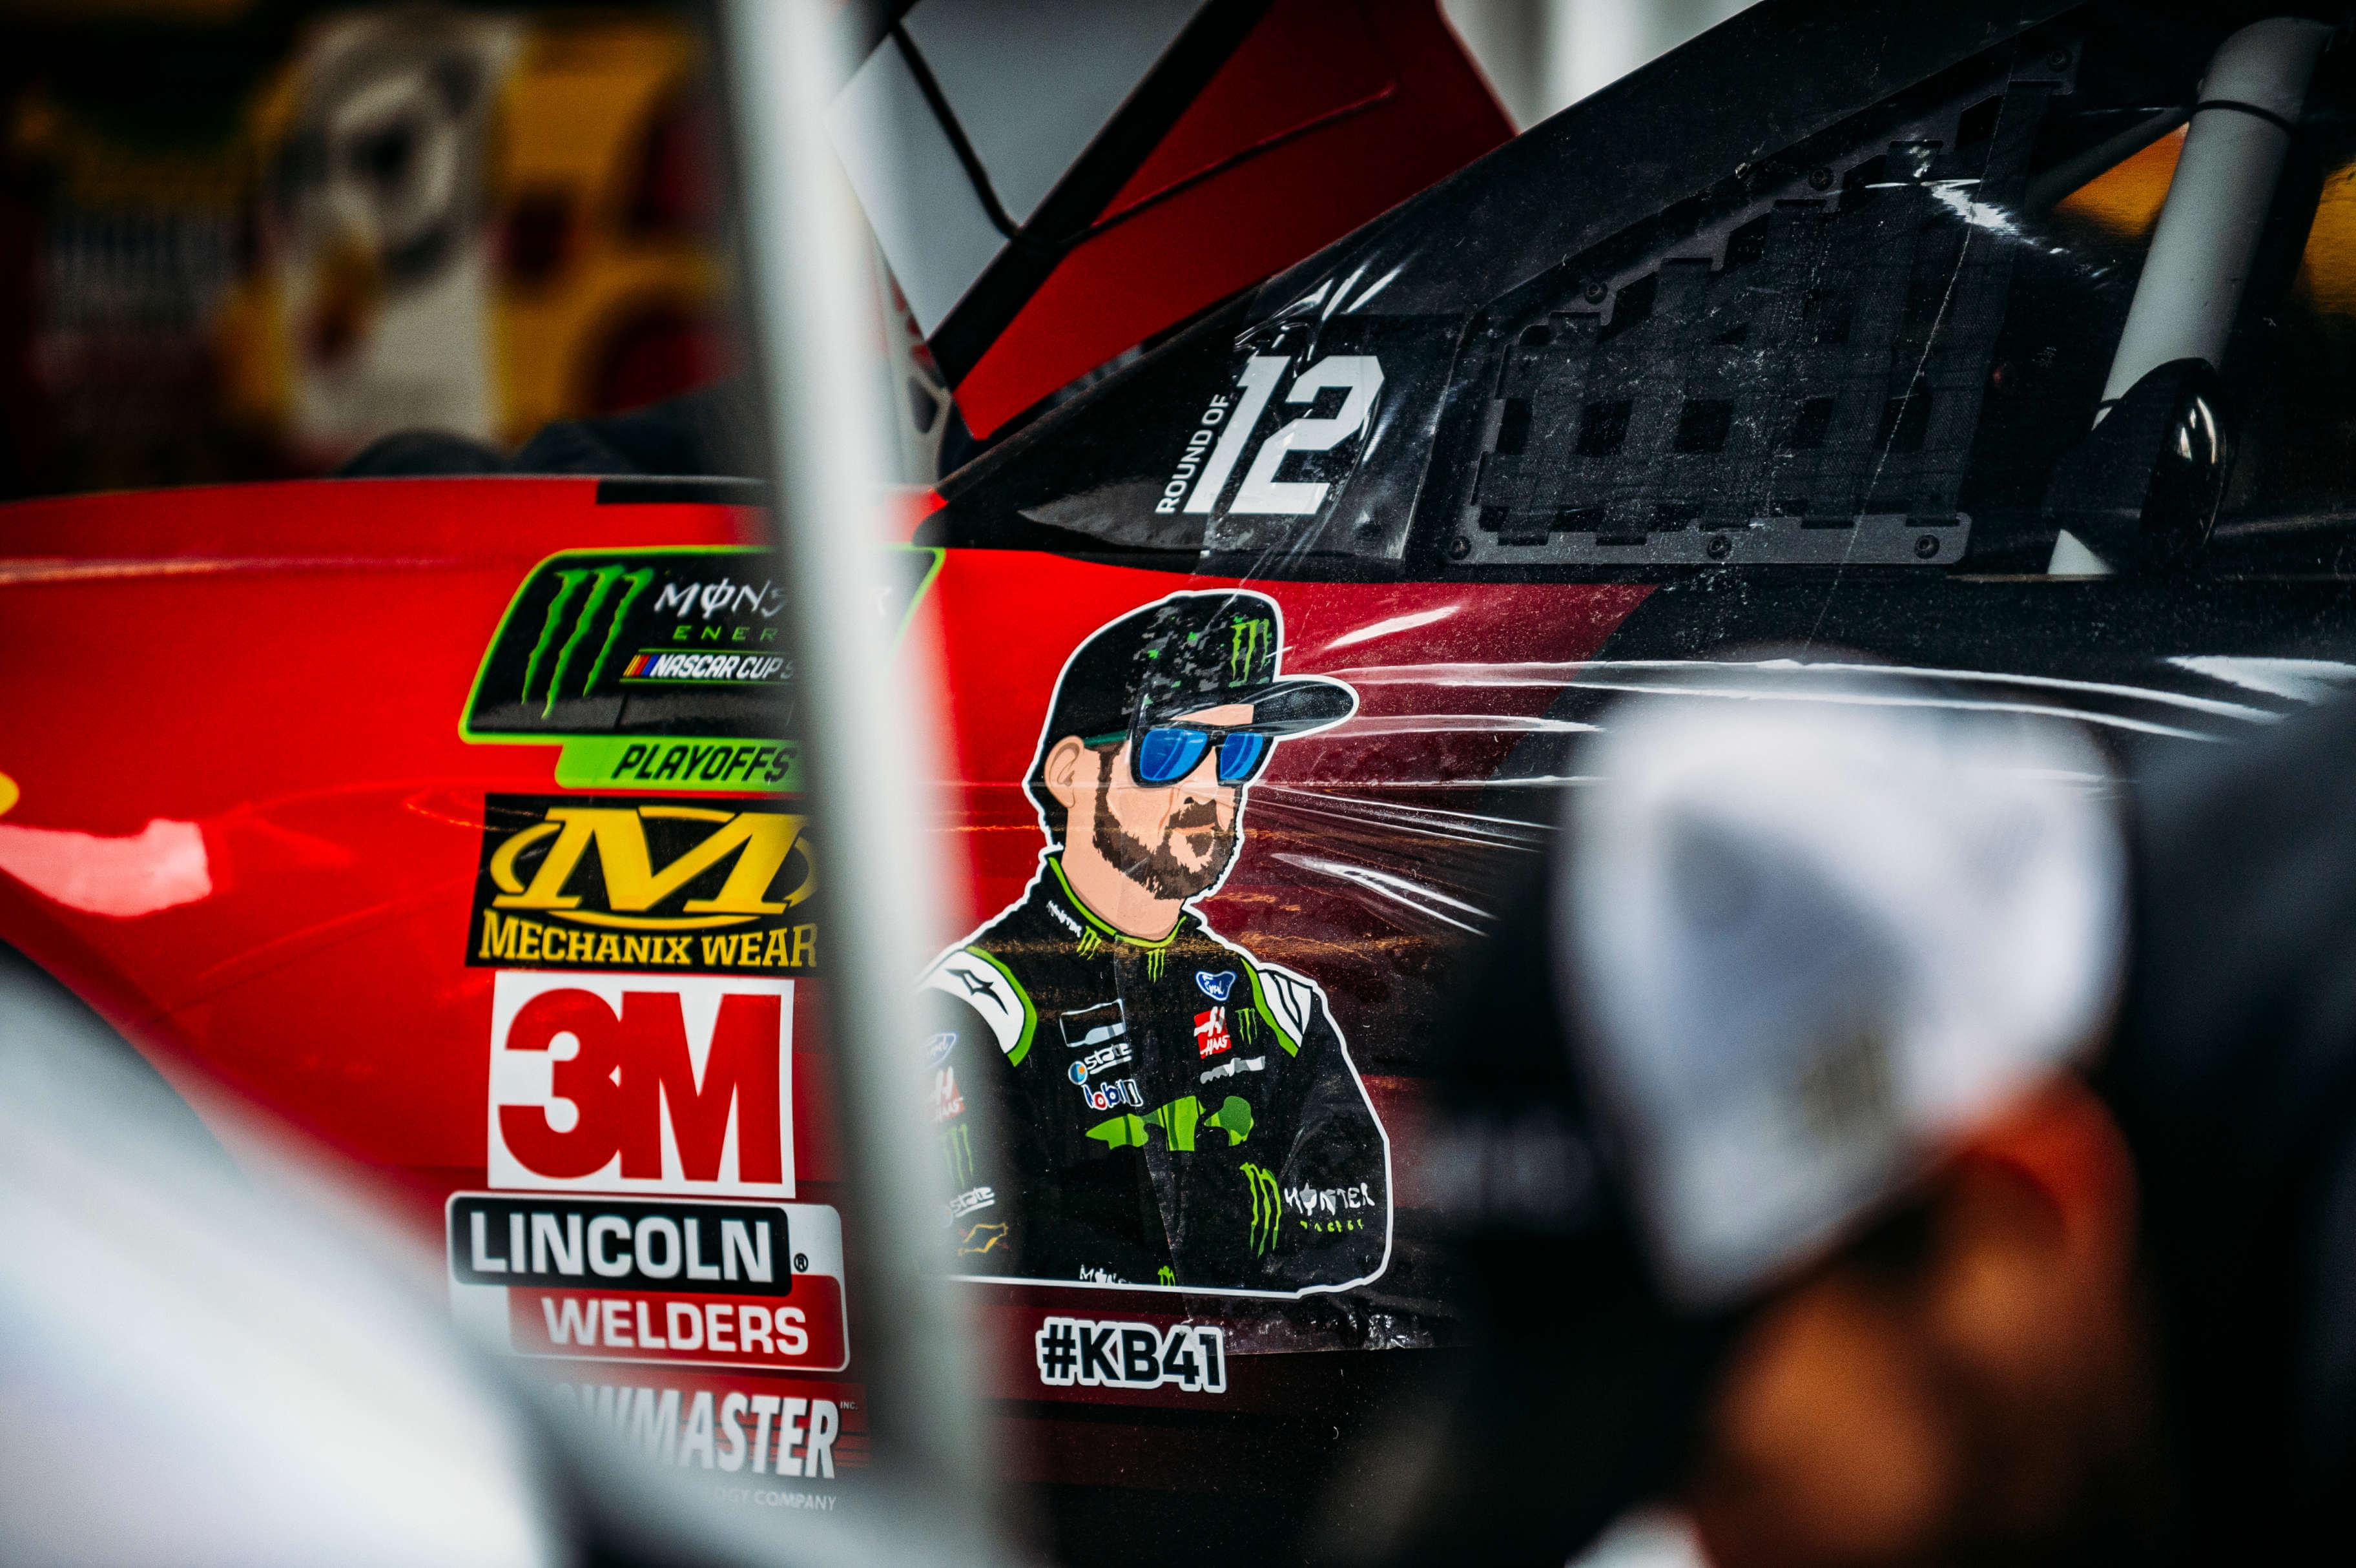 Kurt Busch in the NASCAR garage area at Kansas Speedway (Photo: Jason Hanna | NASCAR Digital Media)